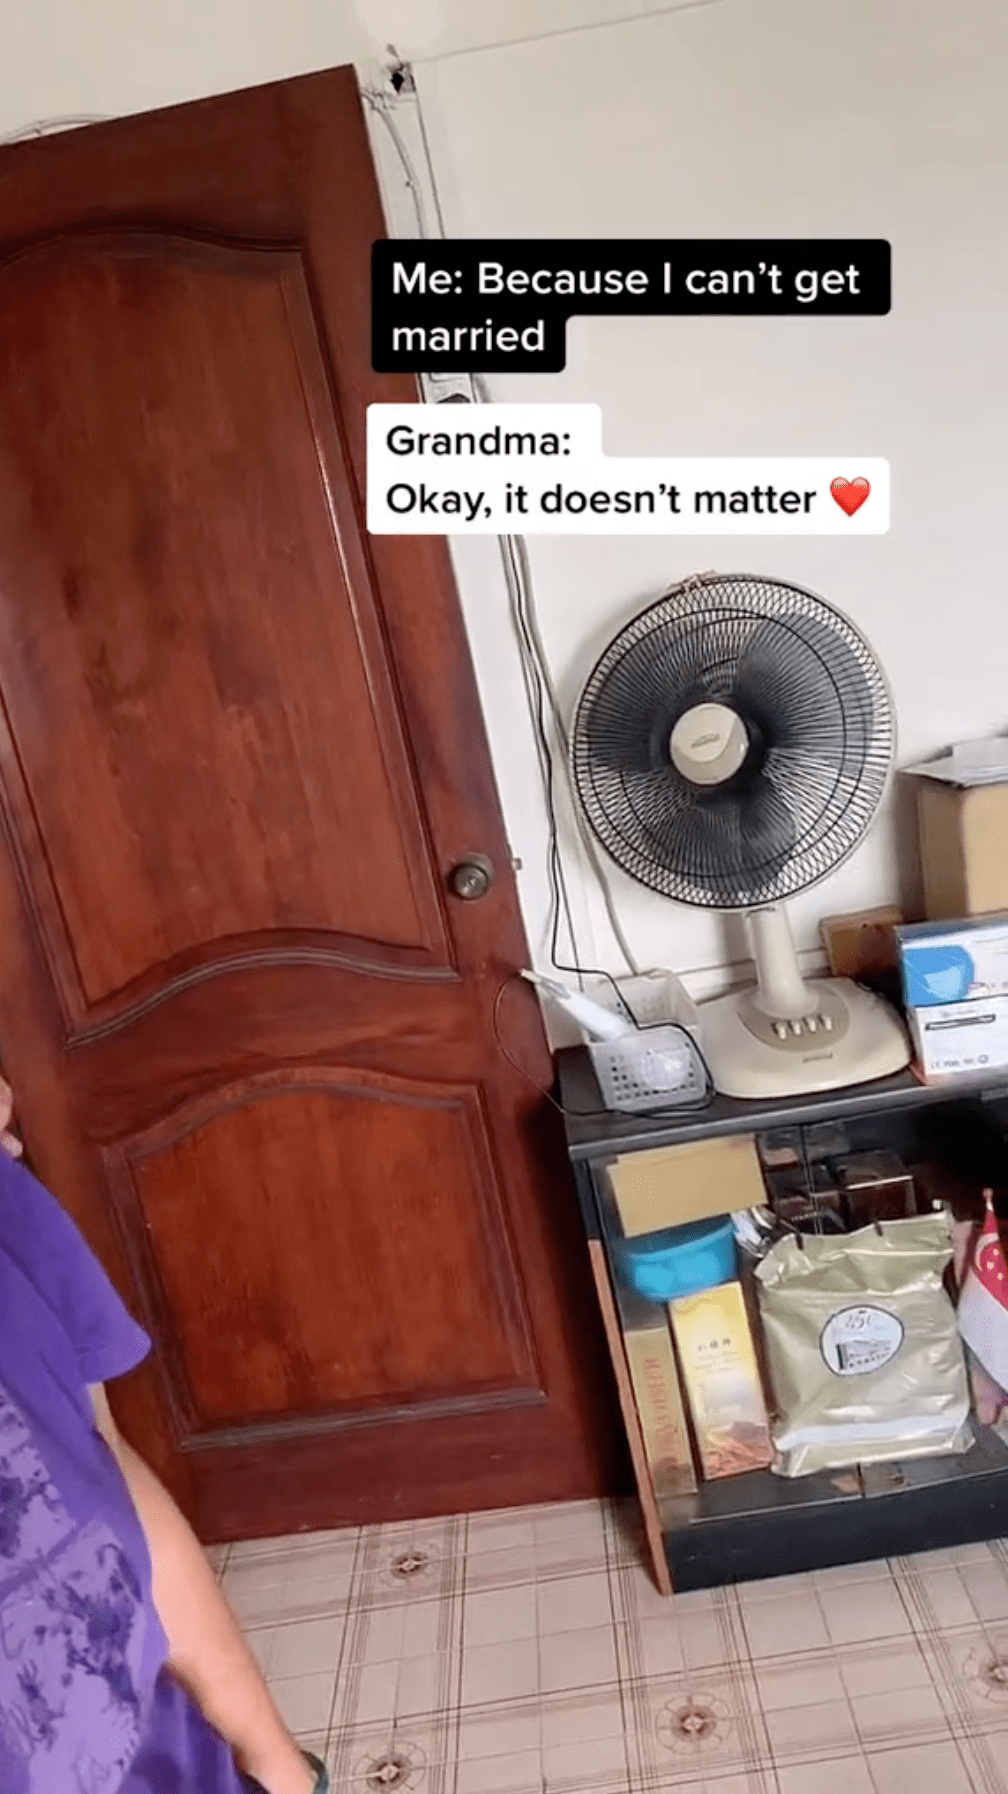 Man comes out grandma